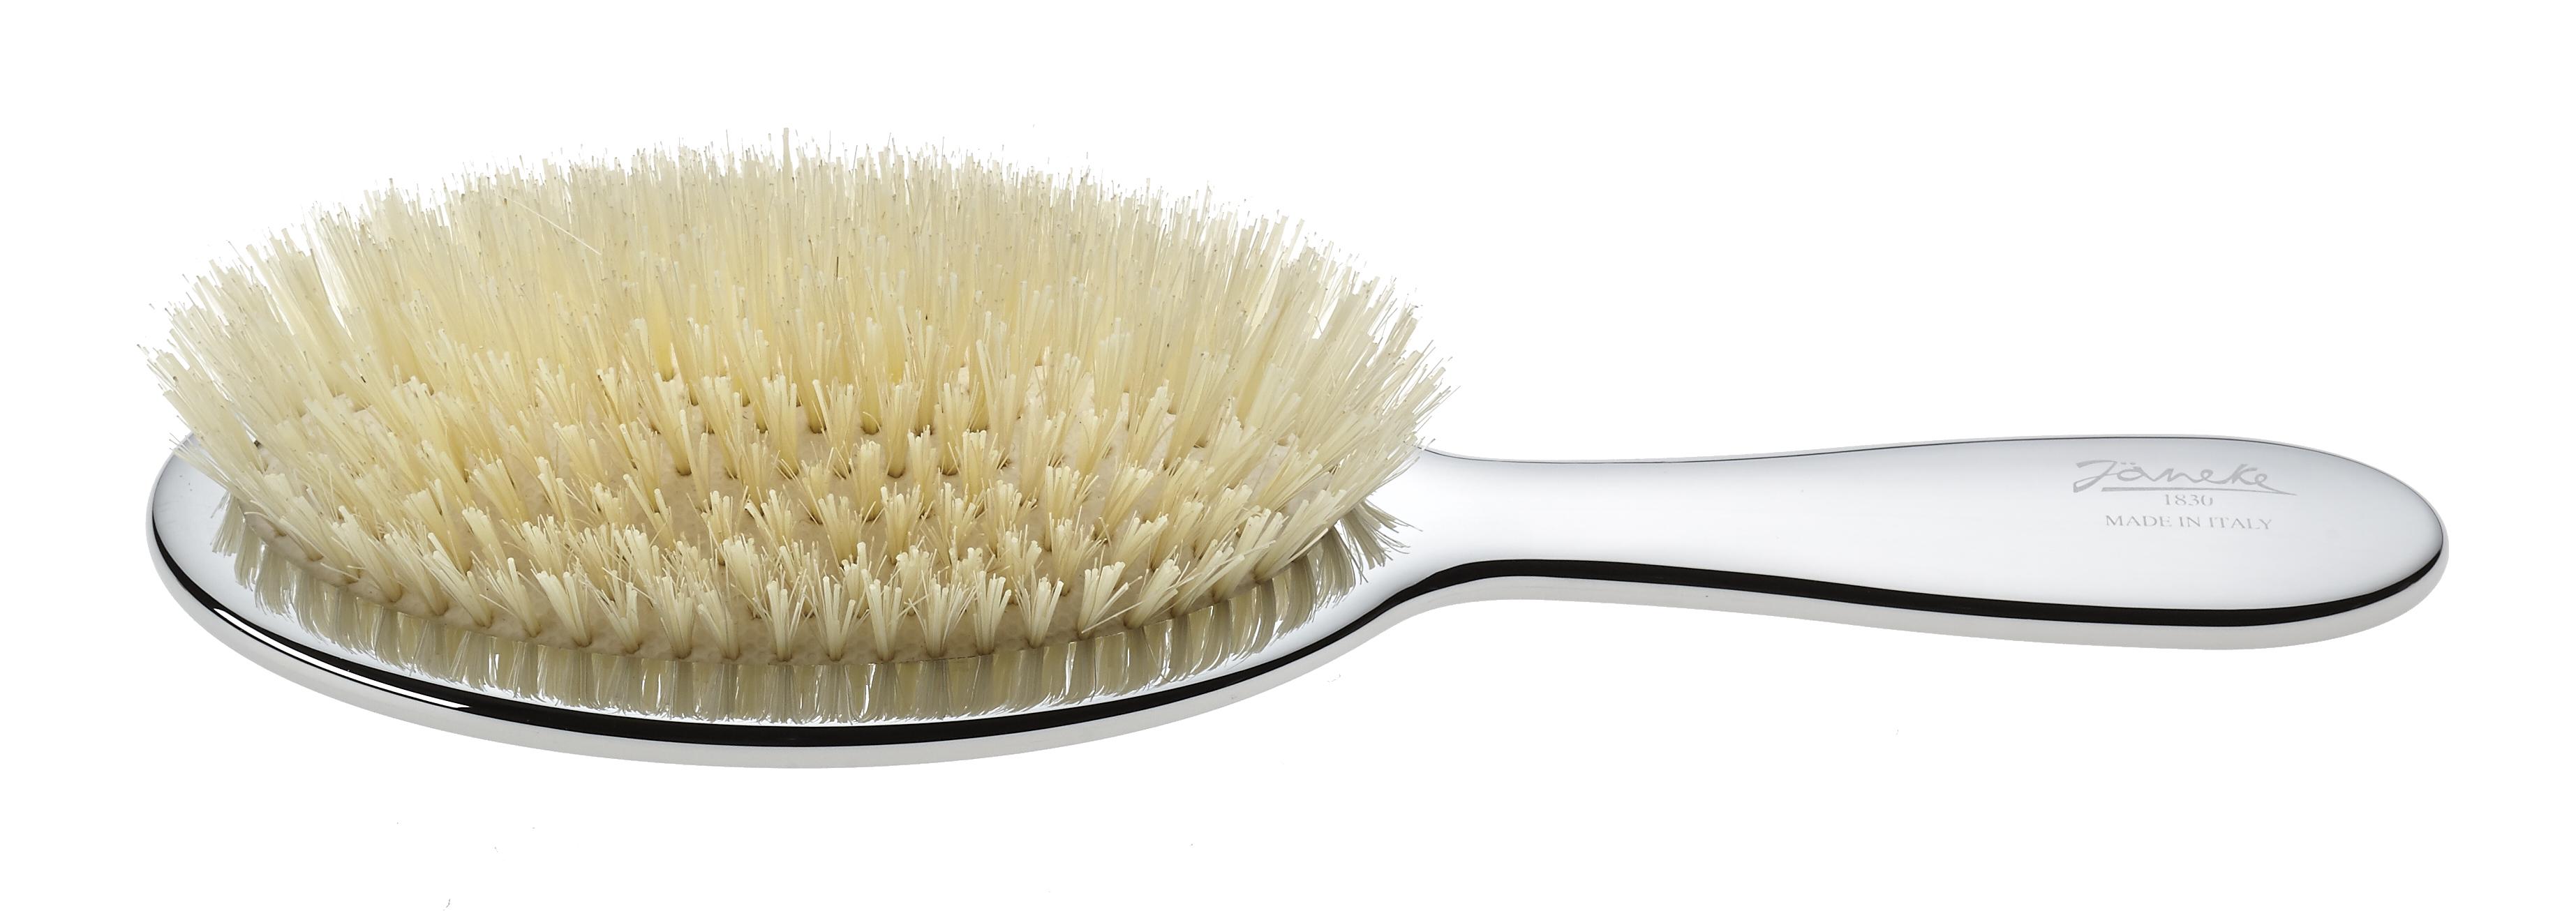 Chromium pneumatic brush with white bristles Cod. CRSP22SF BIA